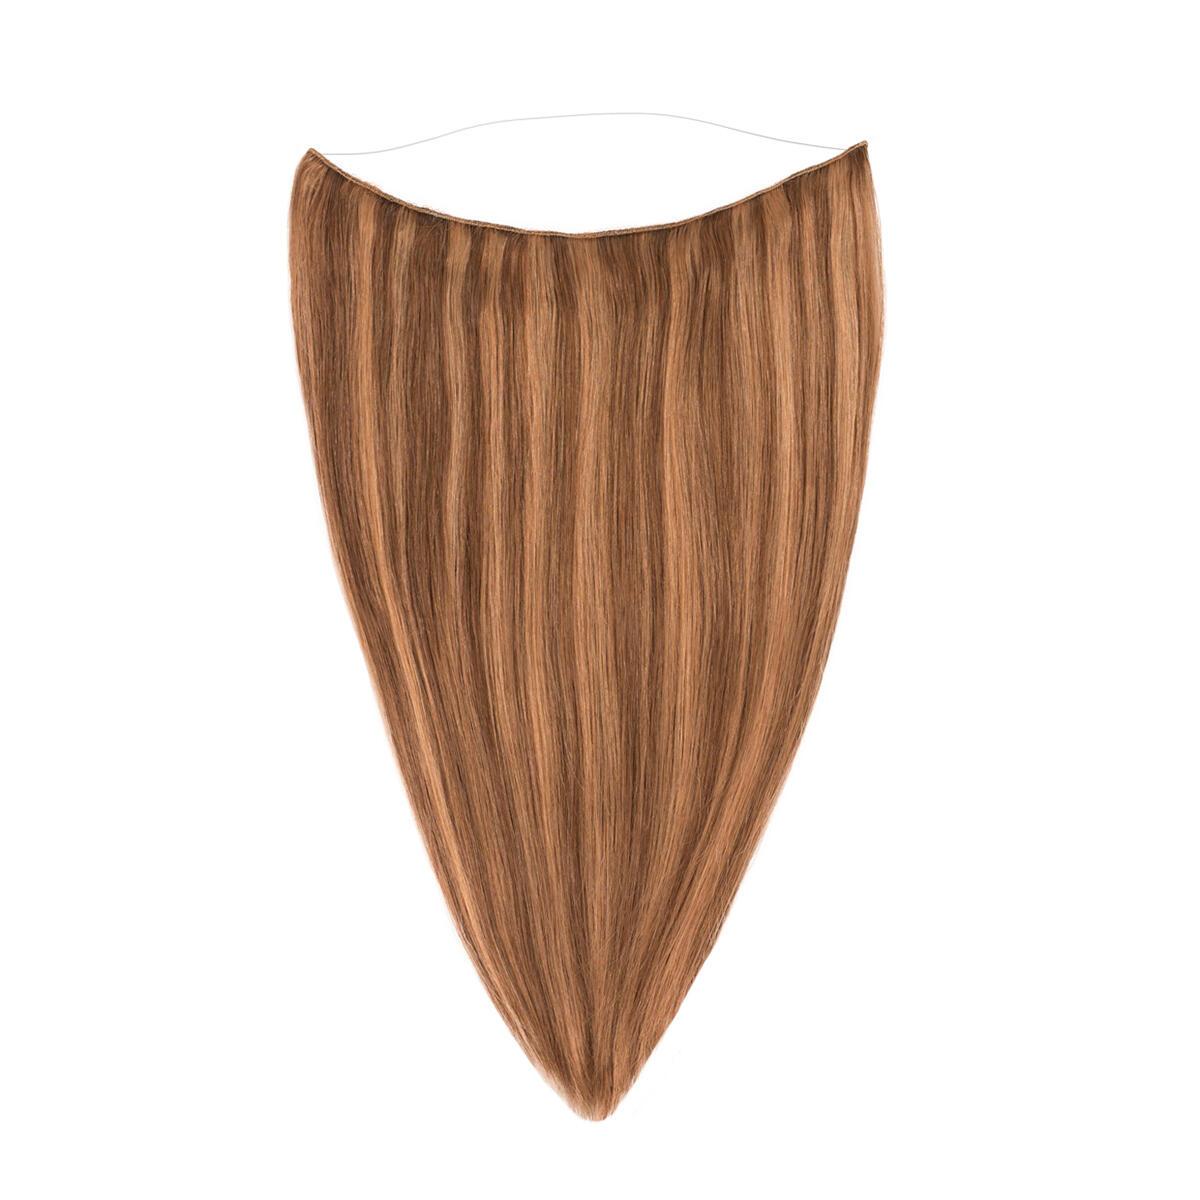 Hairband Original M5.0/7.4 Golden Brown Mix 45 cm